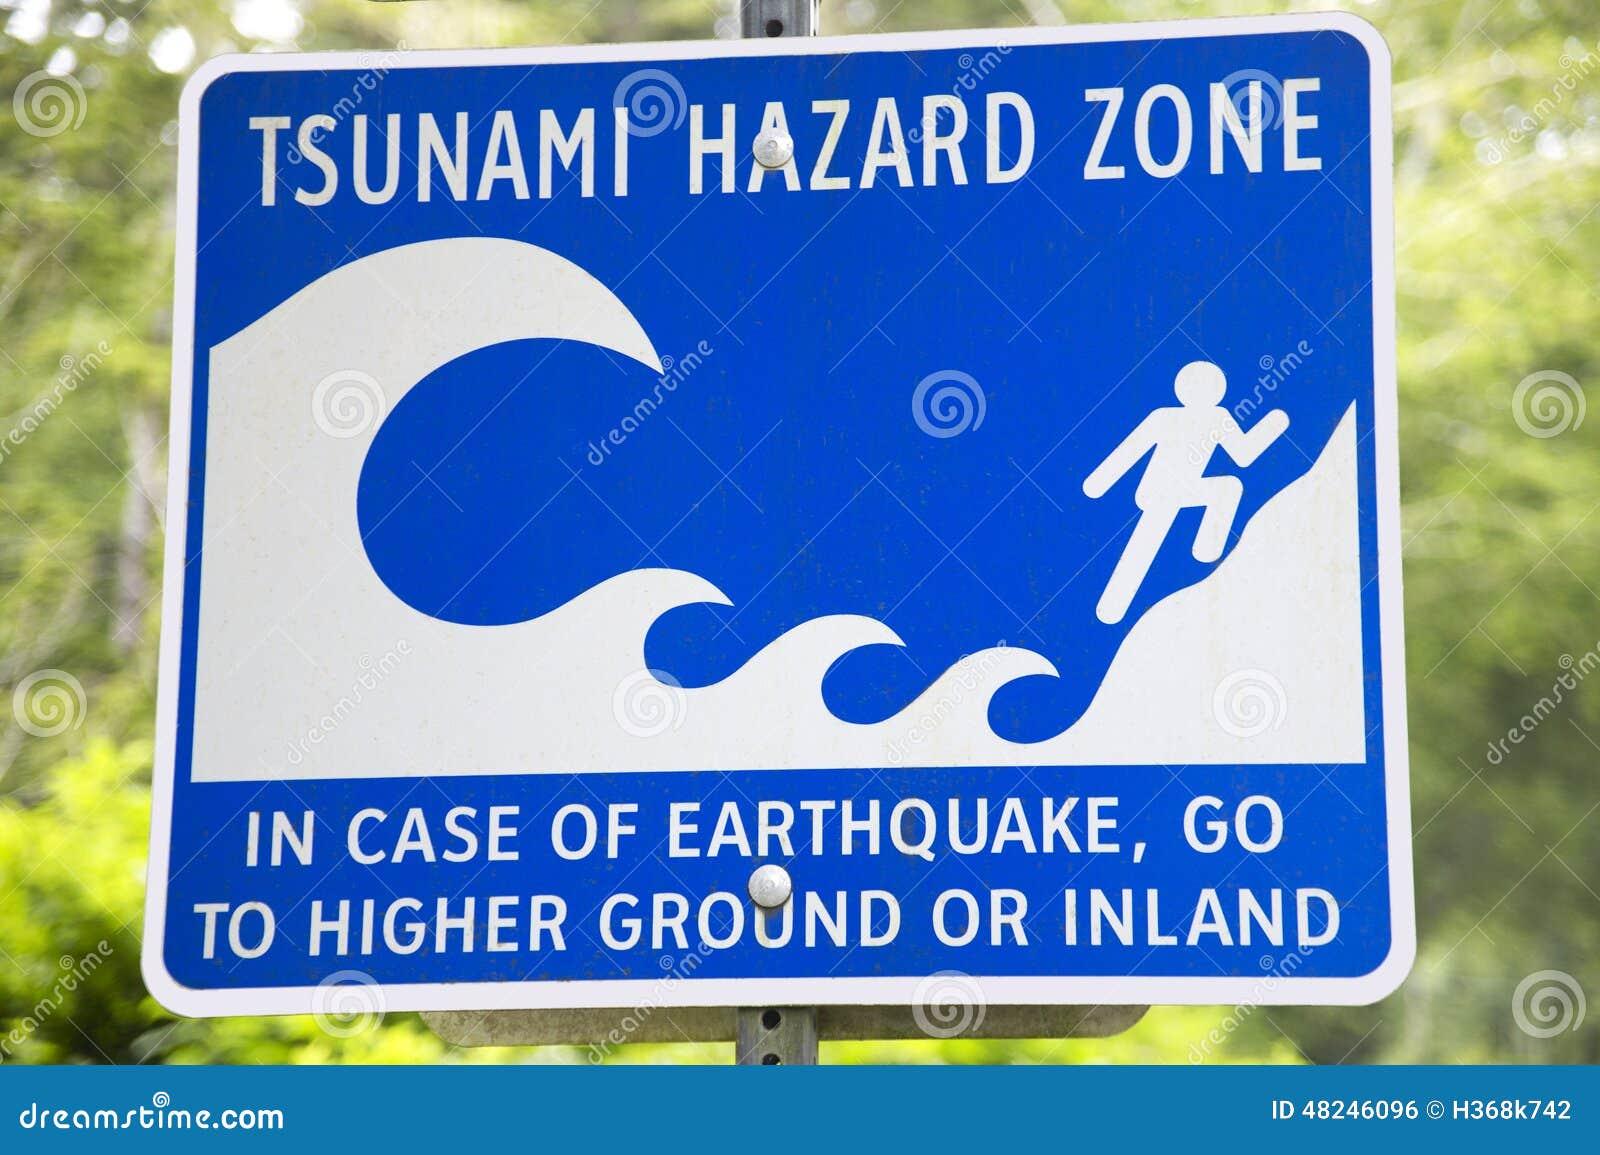 tsunami and earthquake hazard zone signal in vancouver  canada stock photo